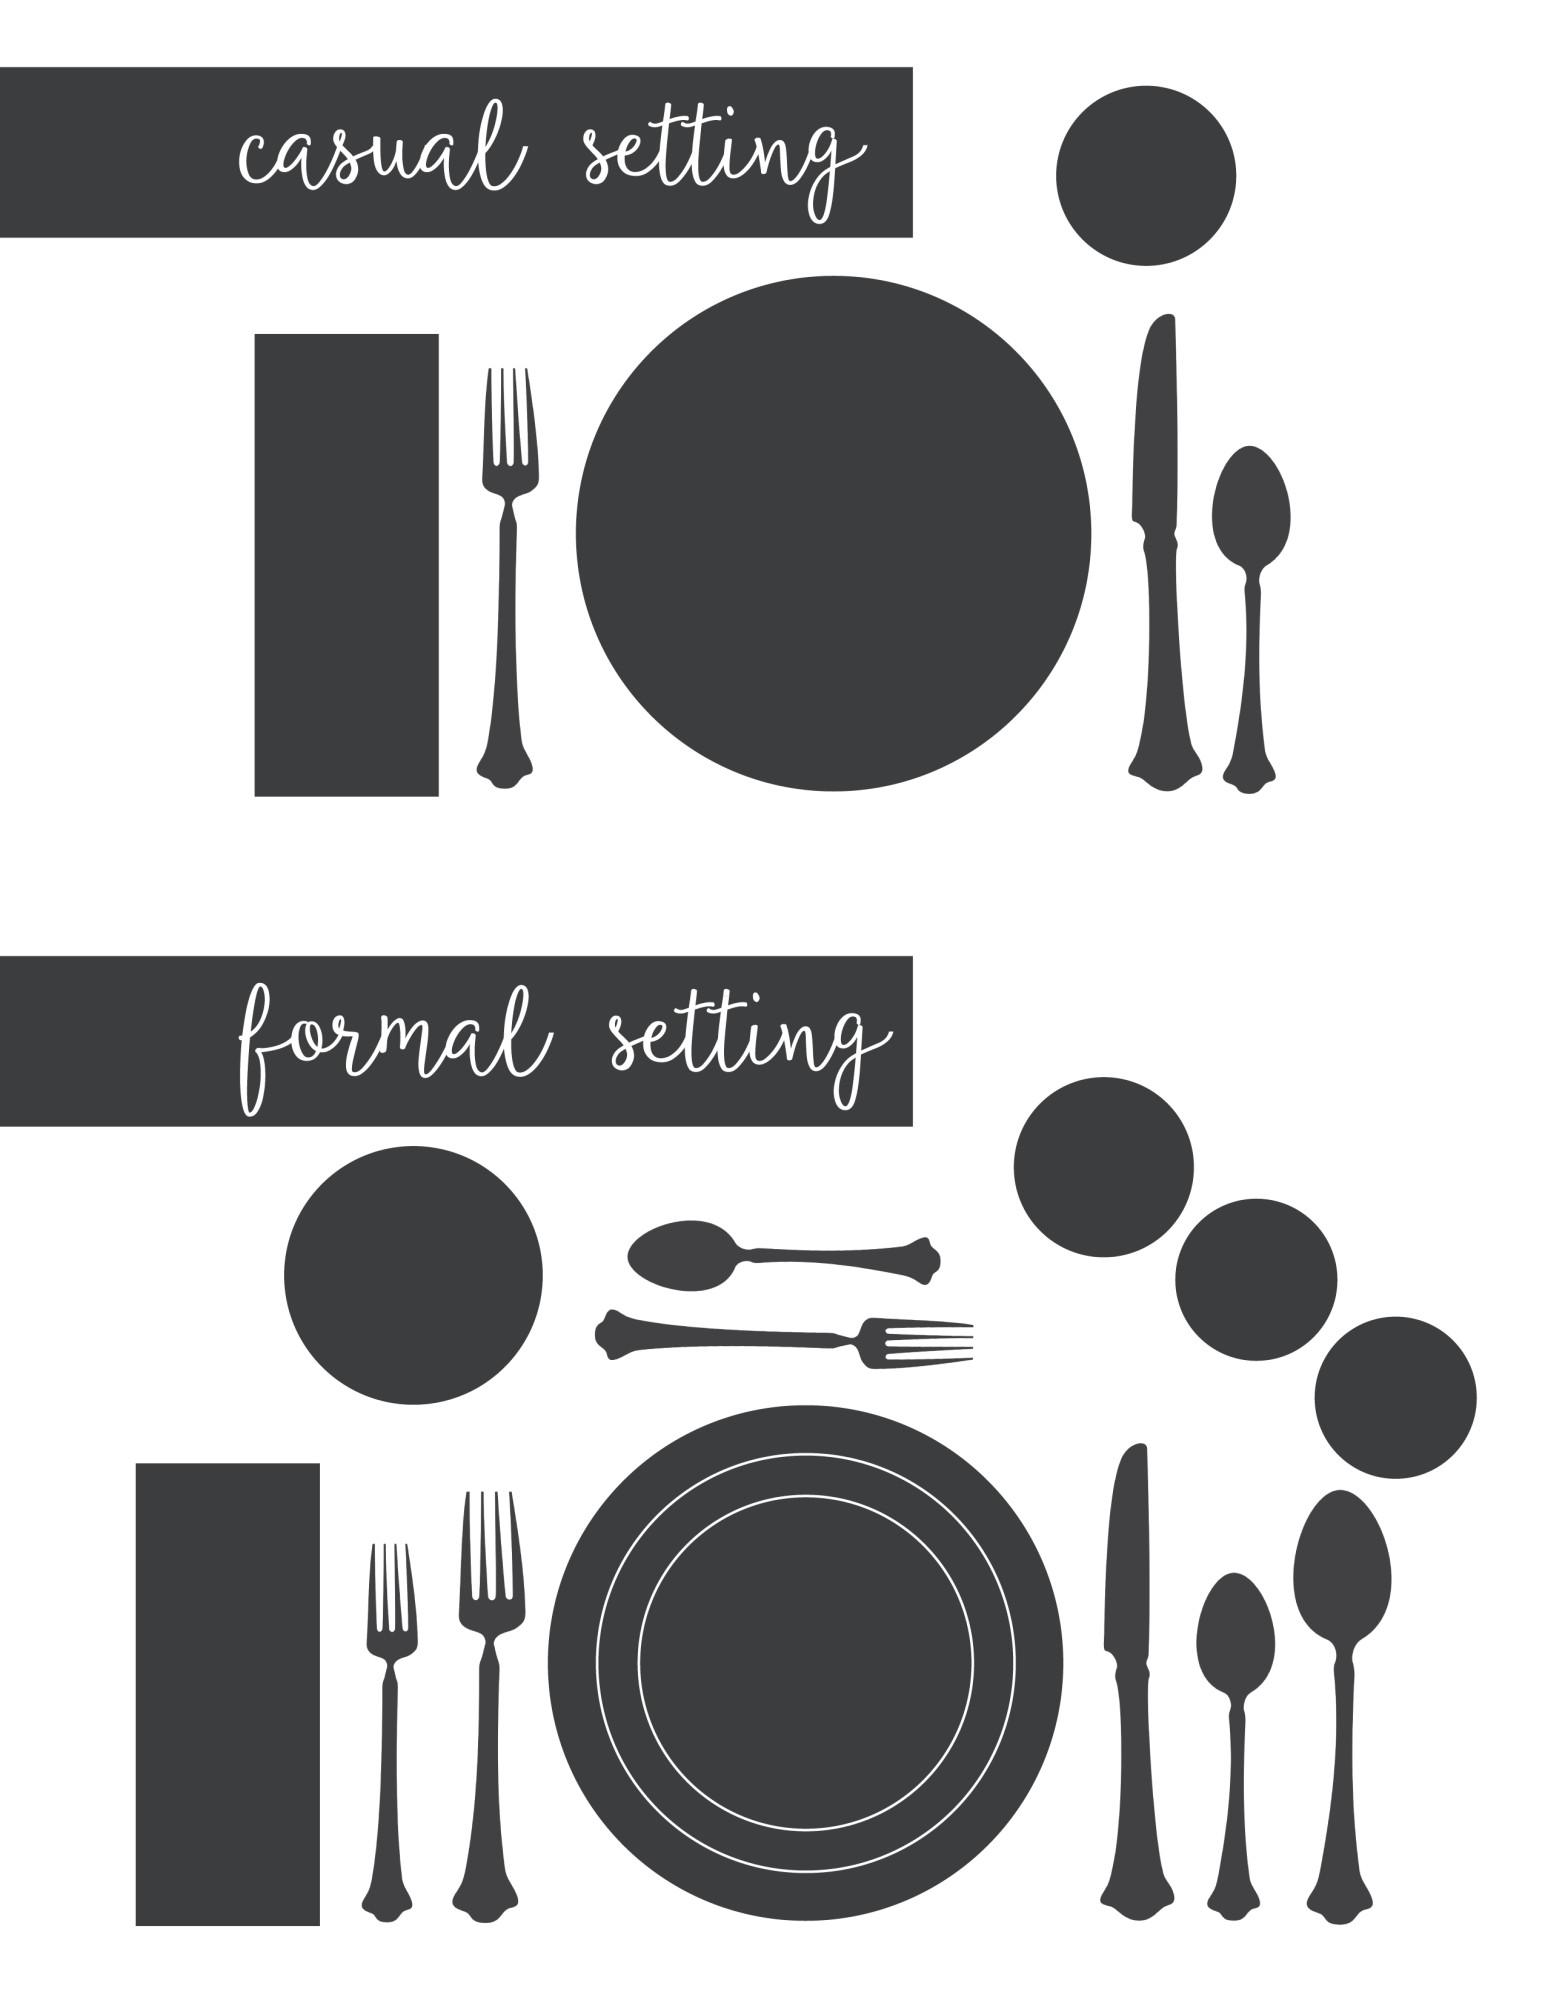 proper-table-setting1-1545x2000.jpg